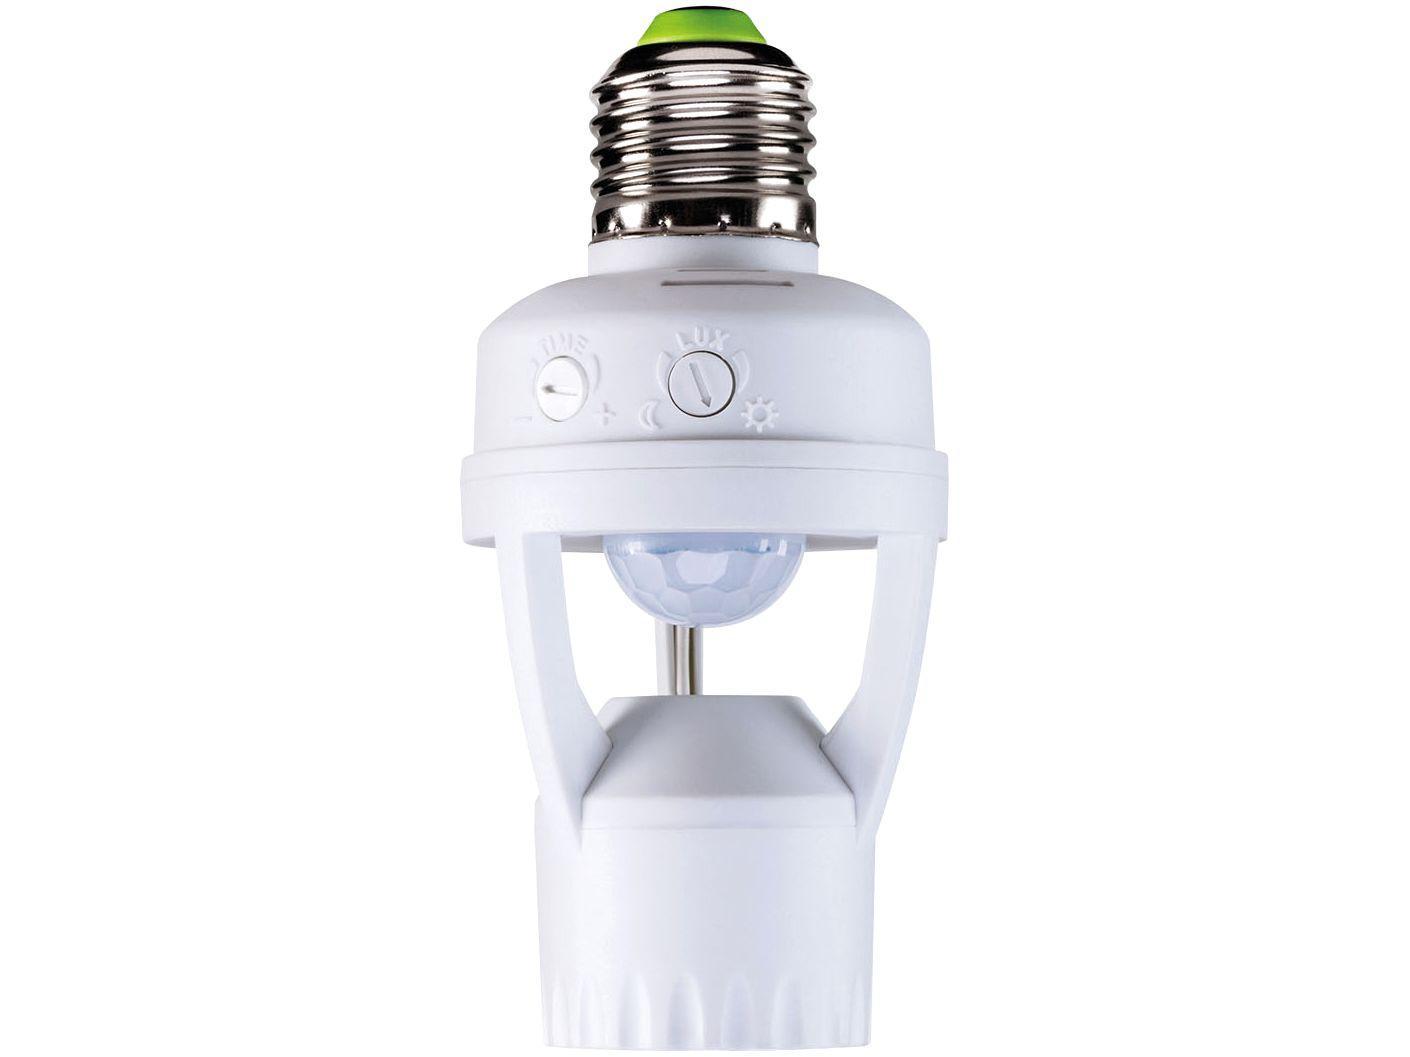 Sensor de Presença Teto Cobertura 360° - Intelbras ESP 360 S